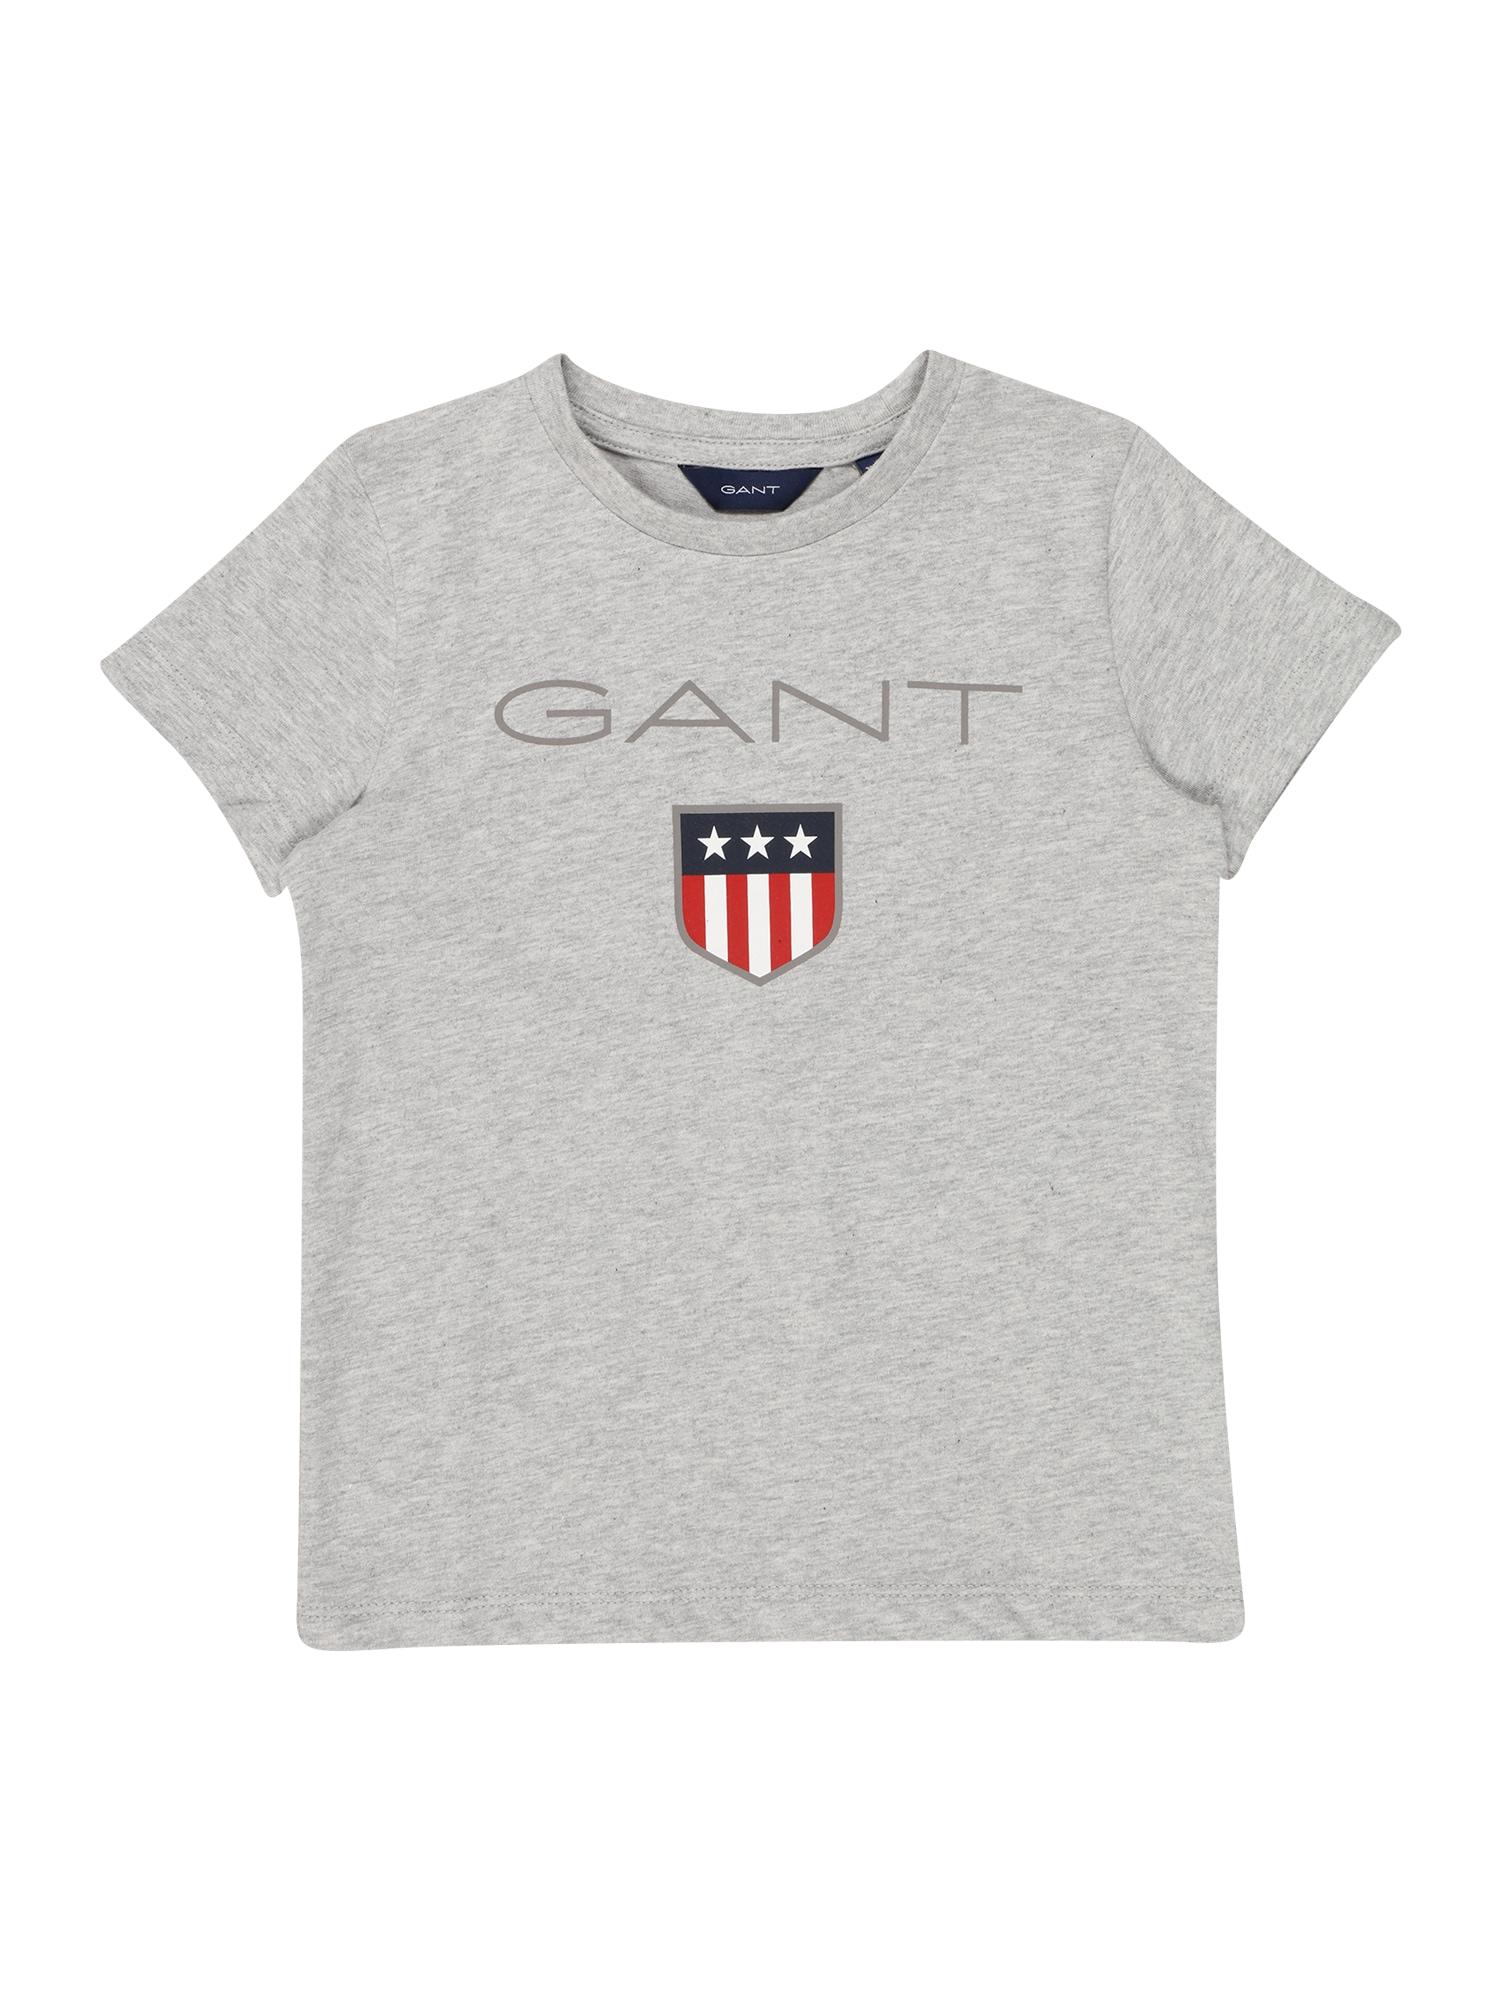 GANT Marškinėliai margai pilka / mėlyna / raudona